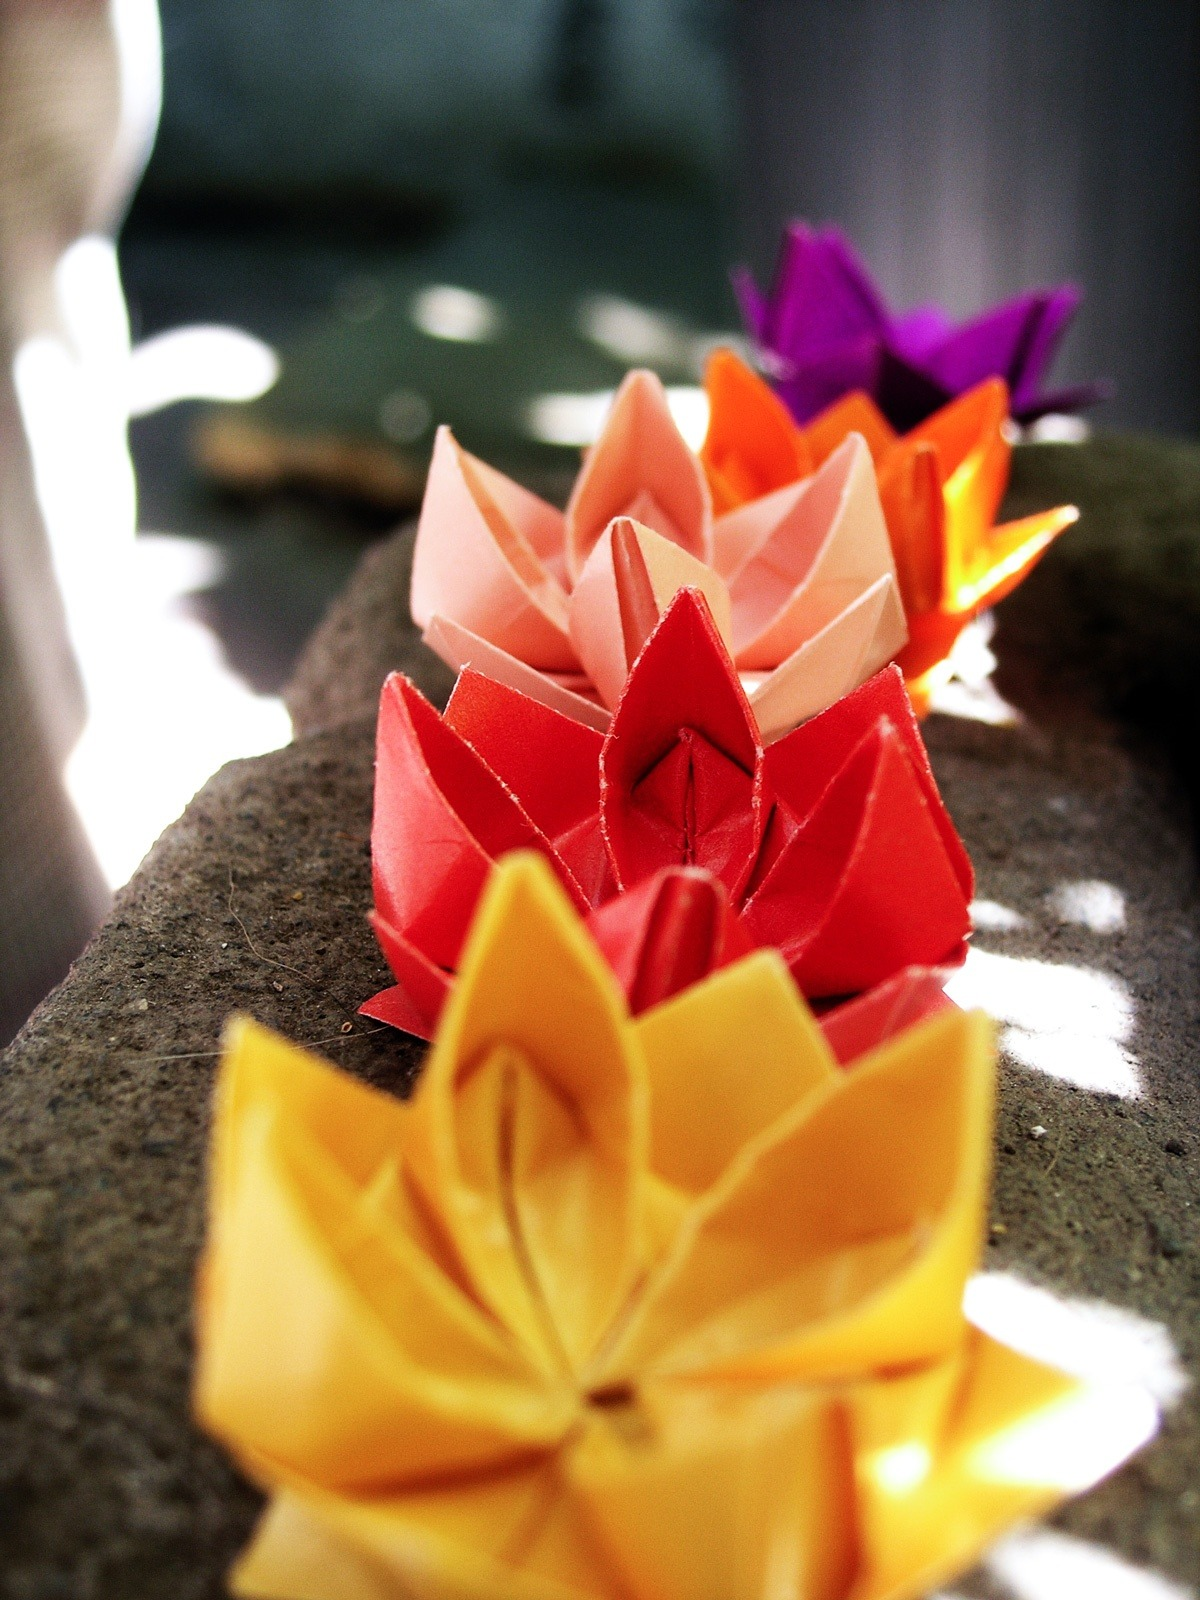 Origami Octagonal Tato / Origami Coaster Tutorial - DIY - Paper ... | 1600x1200